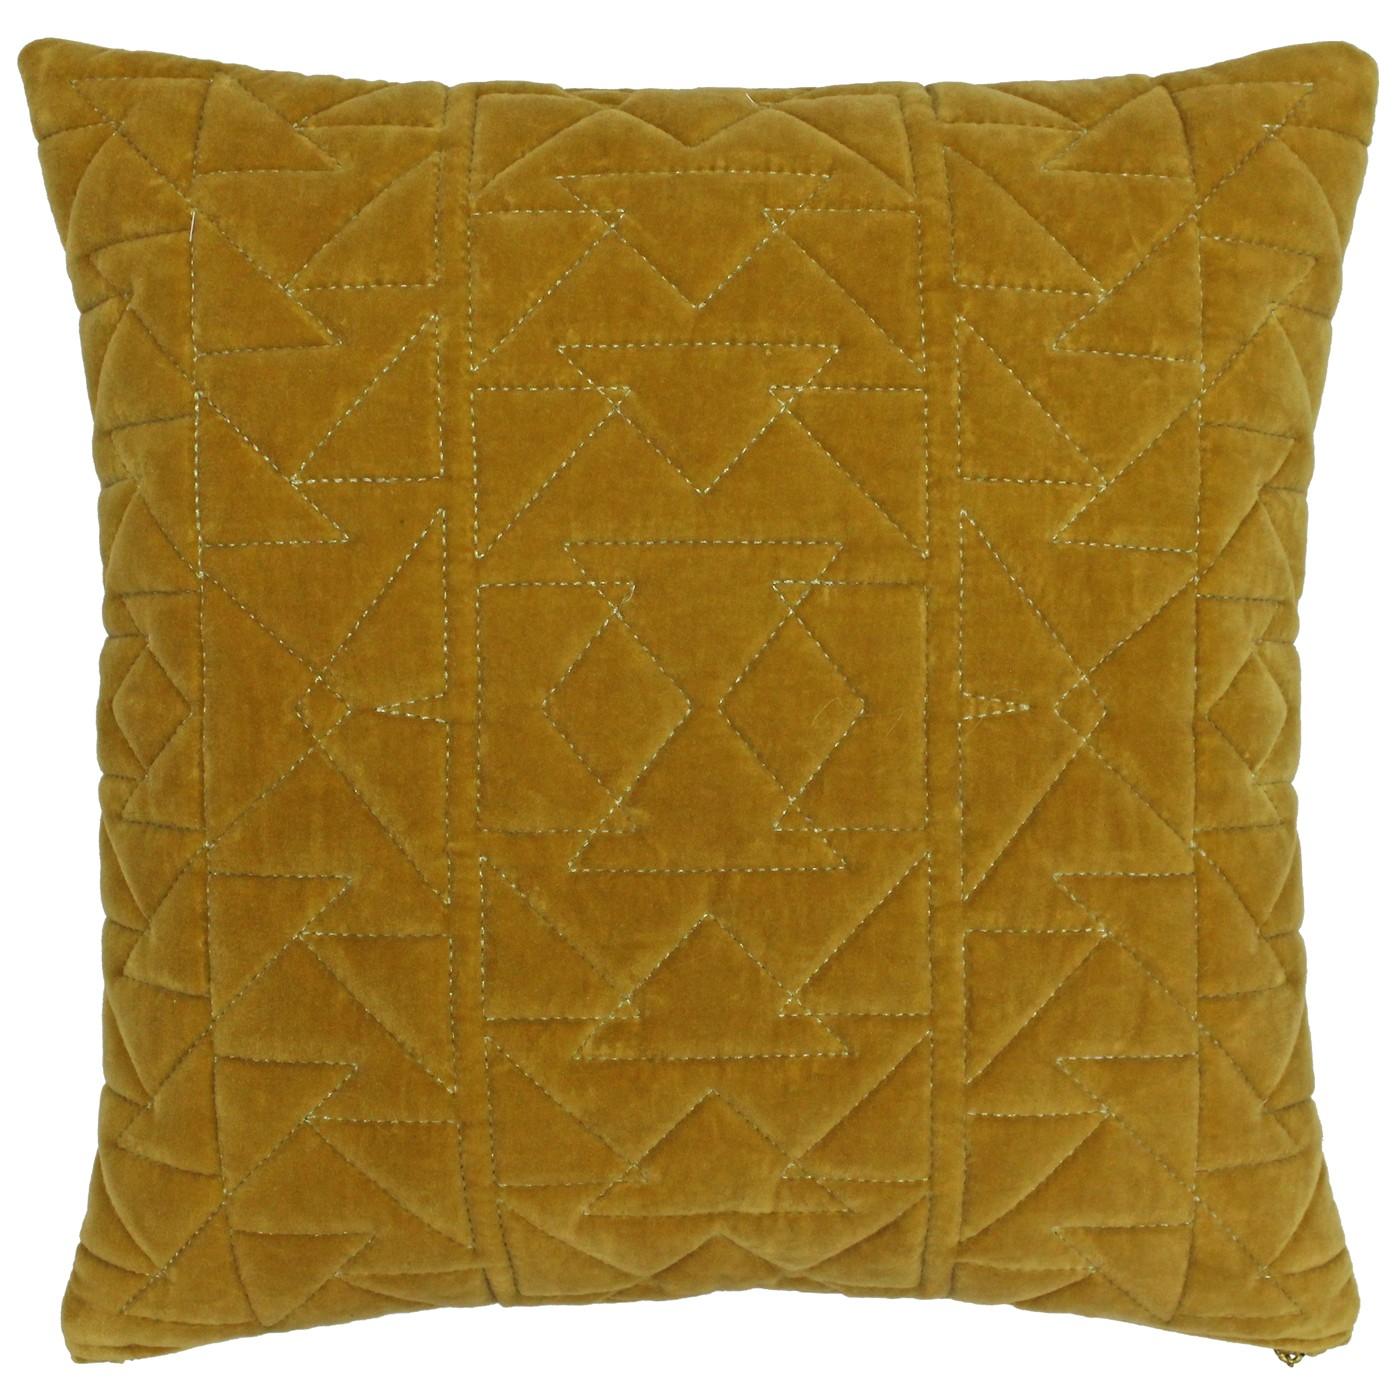 Aztec Cushion Ochre